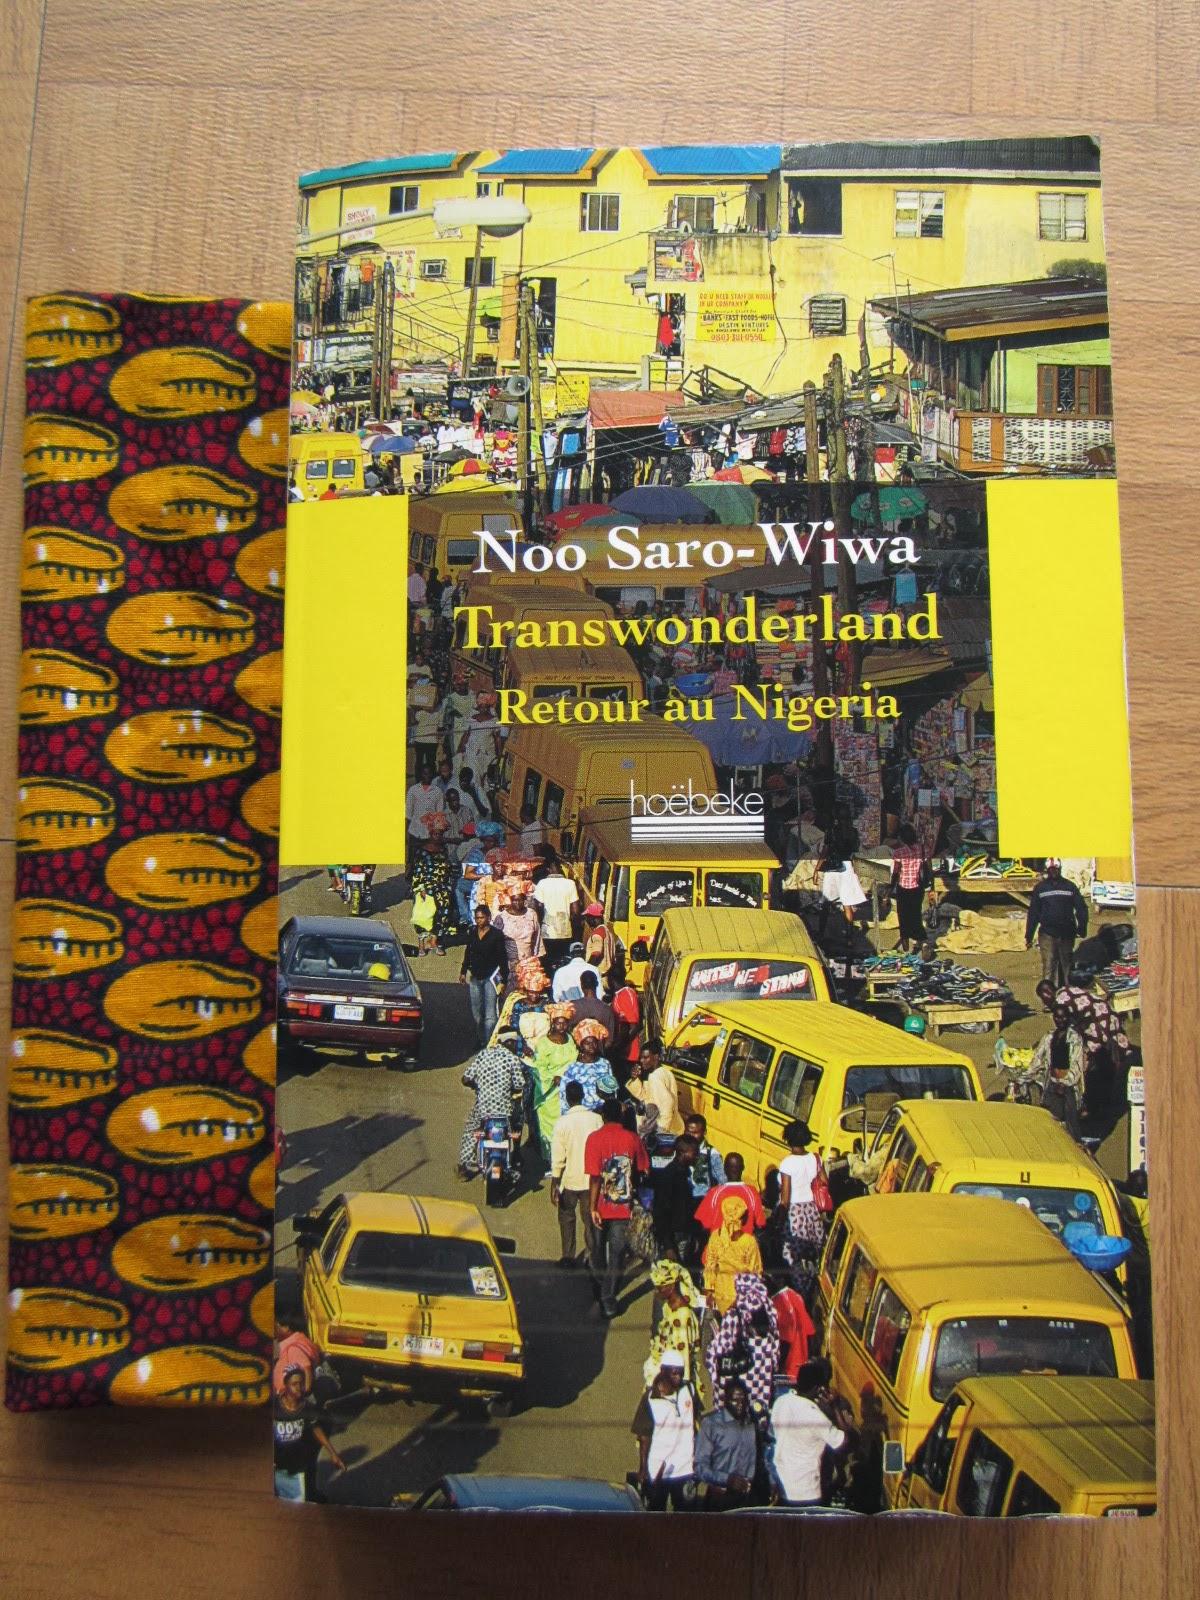 Littérature Africaine Transwonderland Retour au Nigéria de Noo Saro-Wiwa